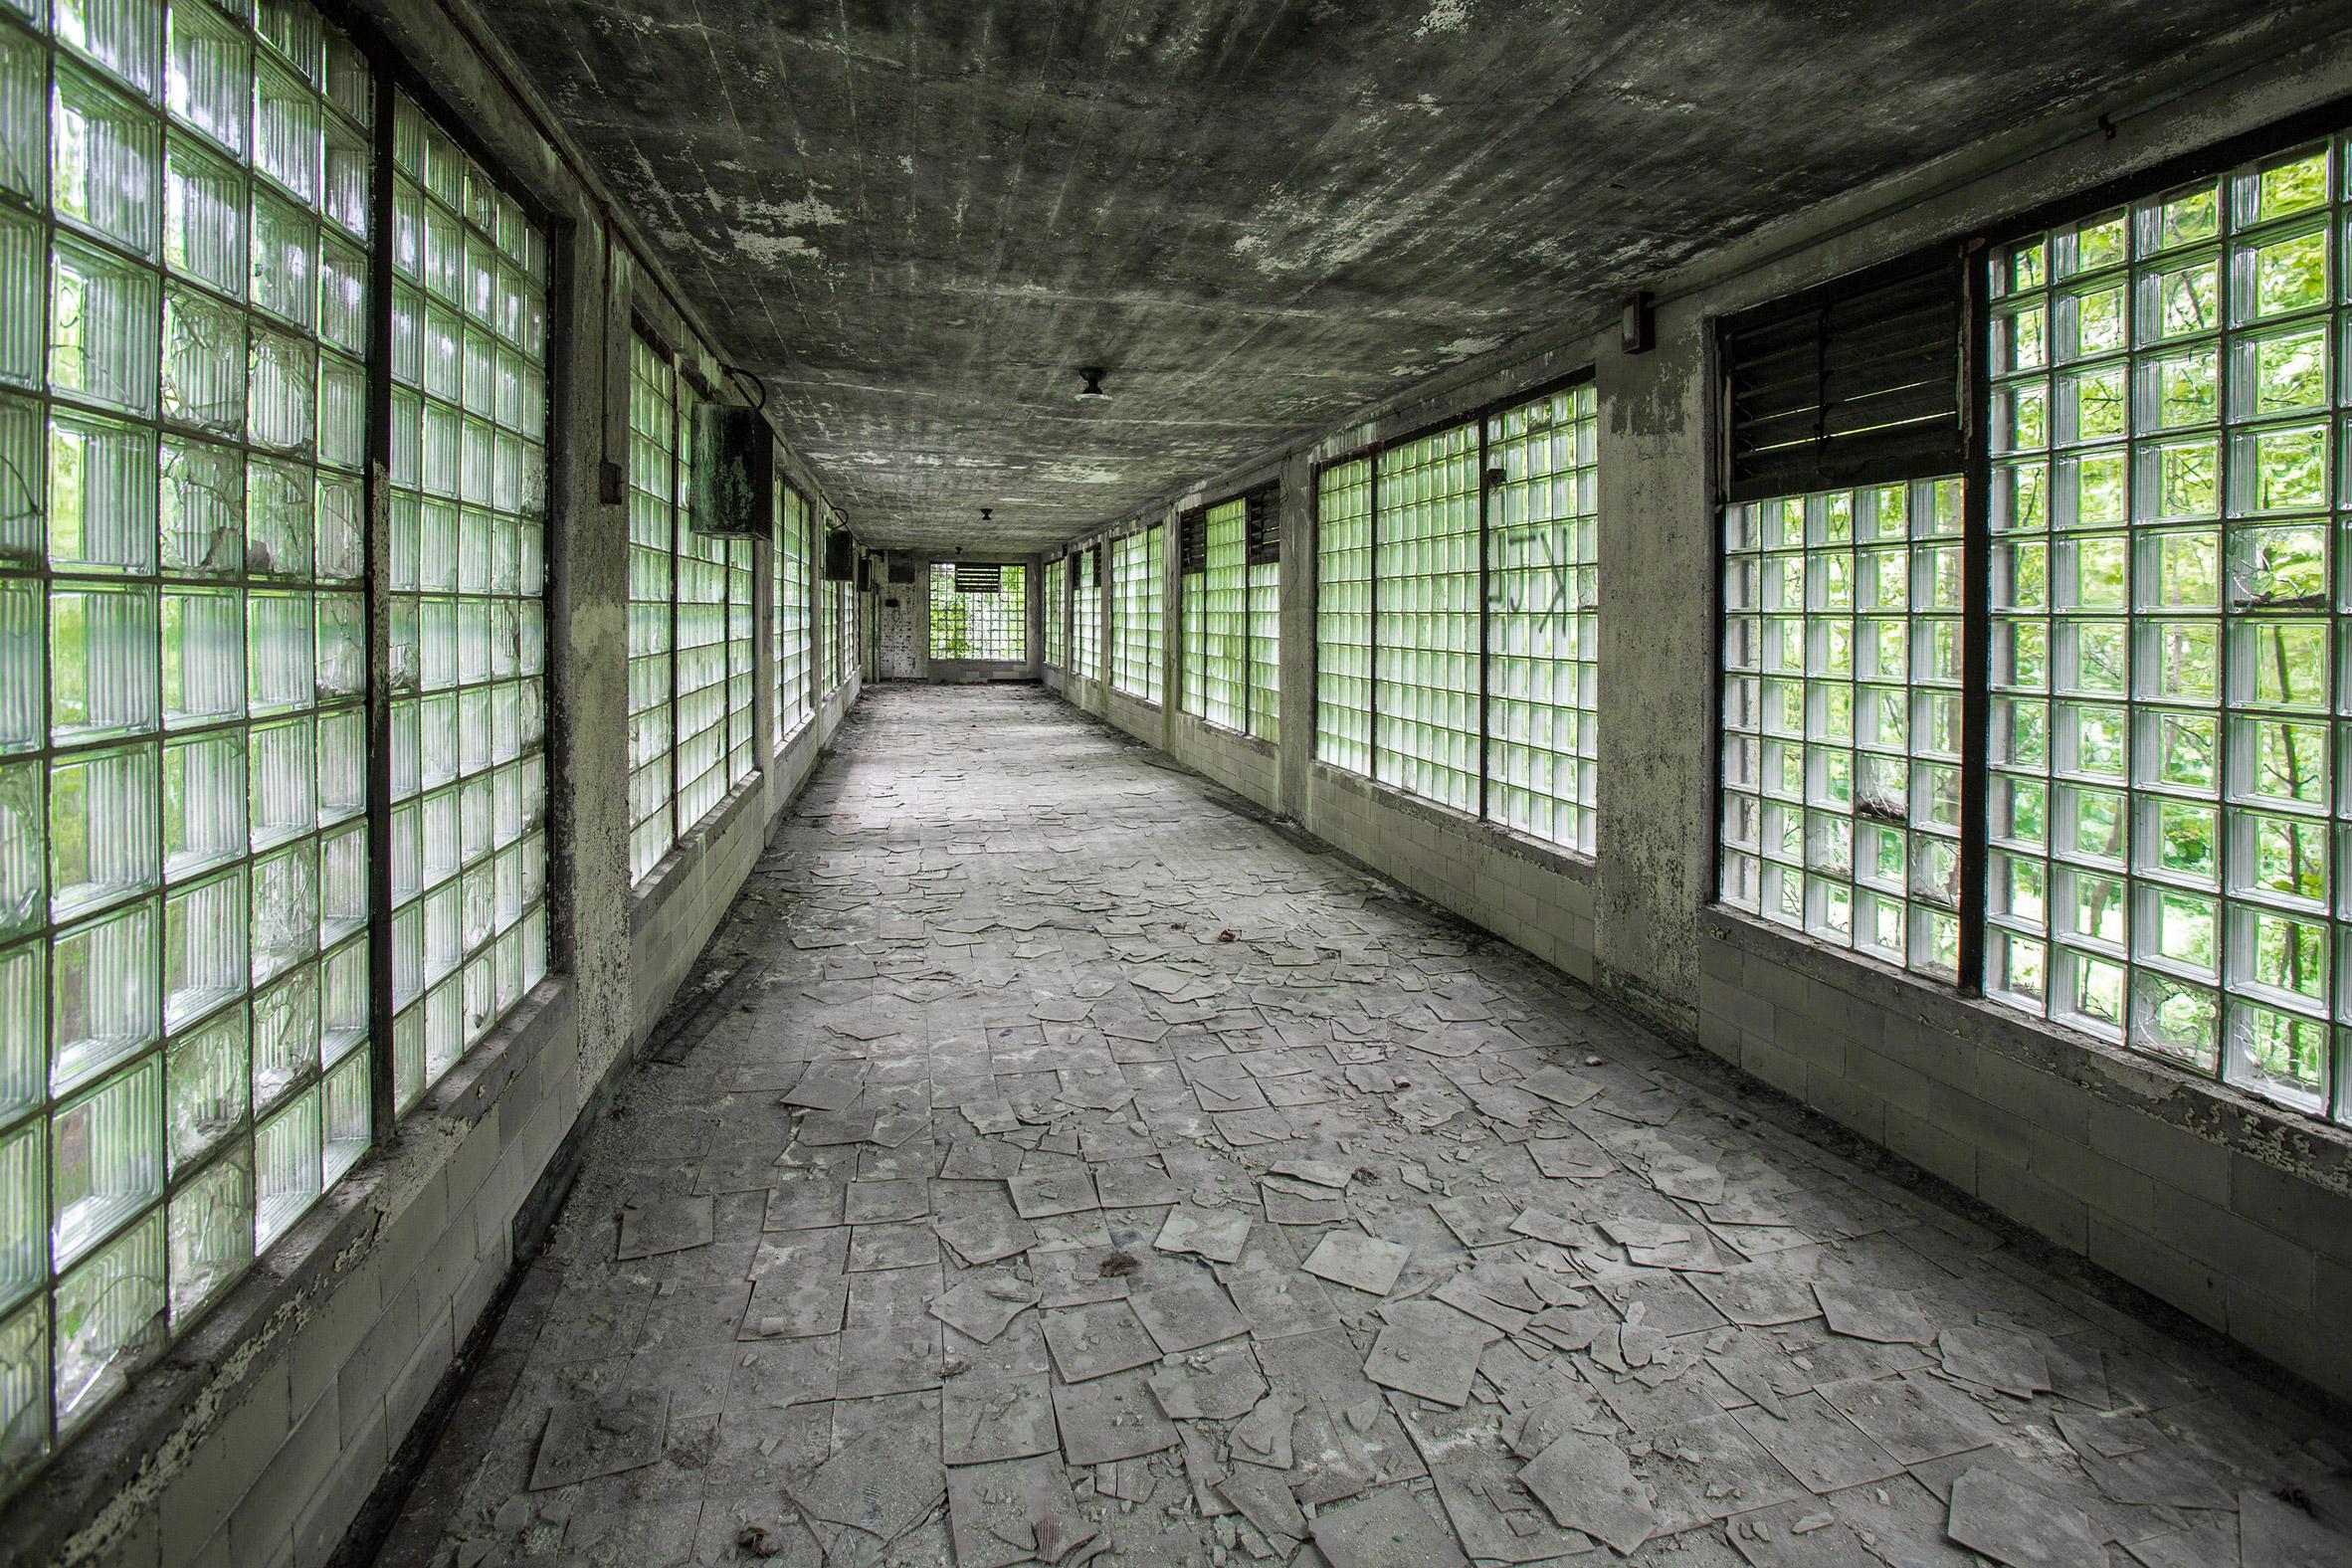 Abandoned-Asylums-13.jpg